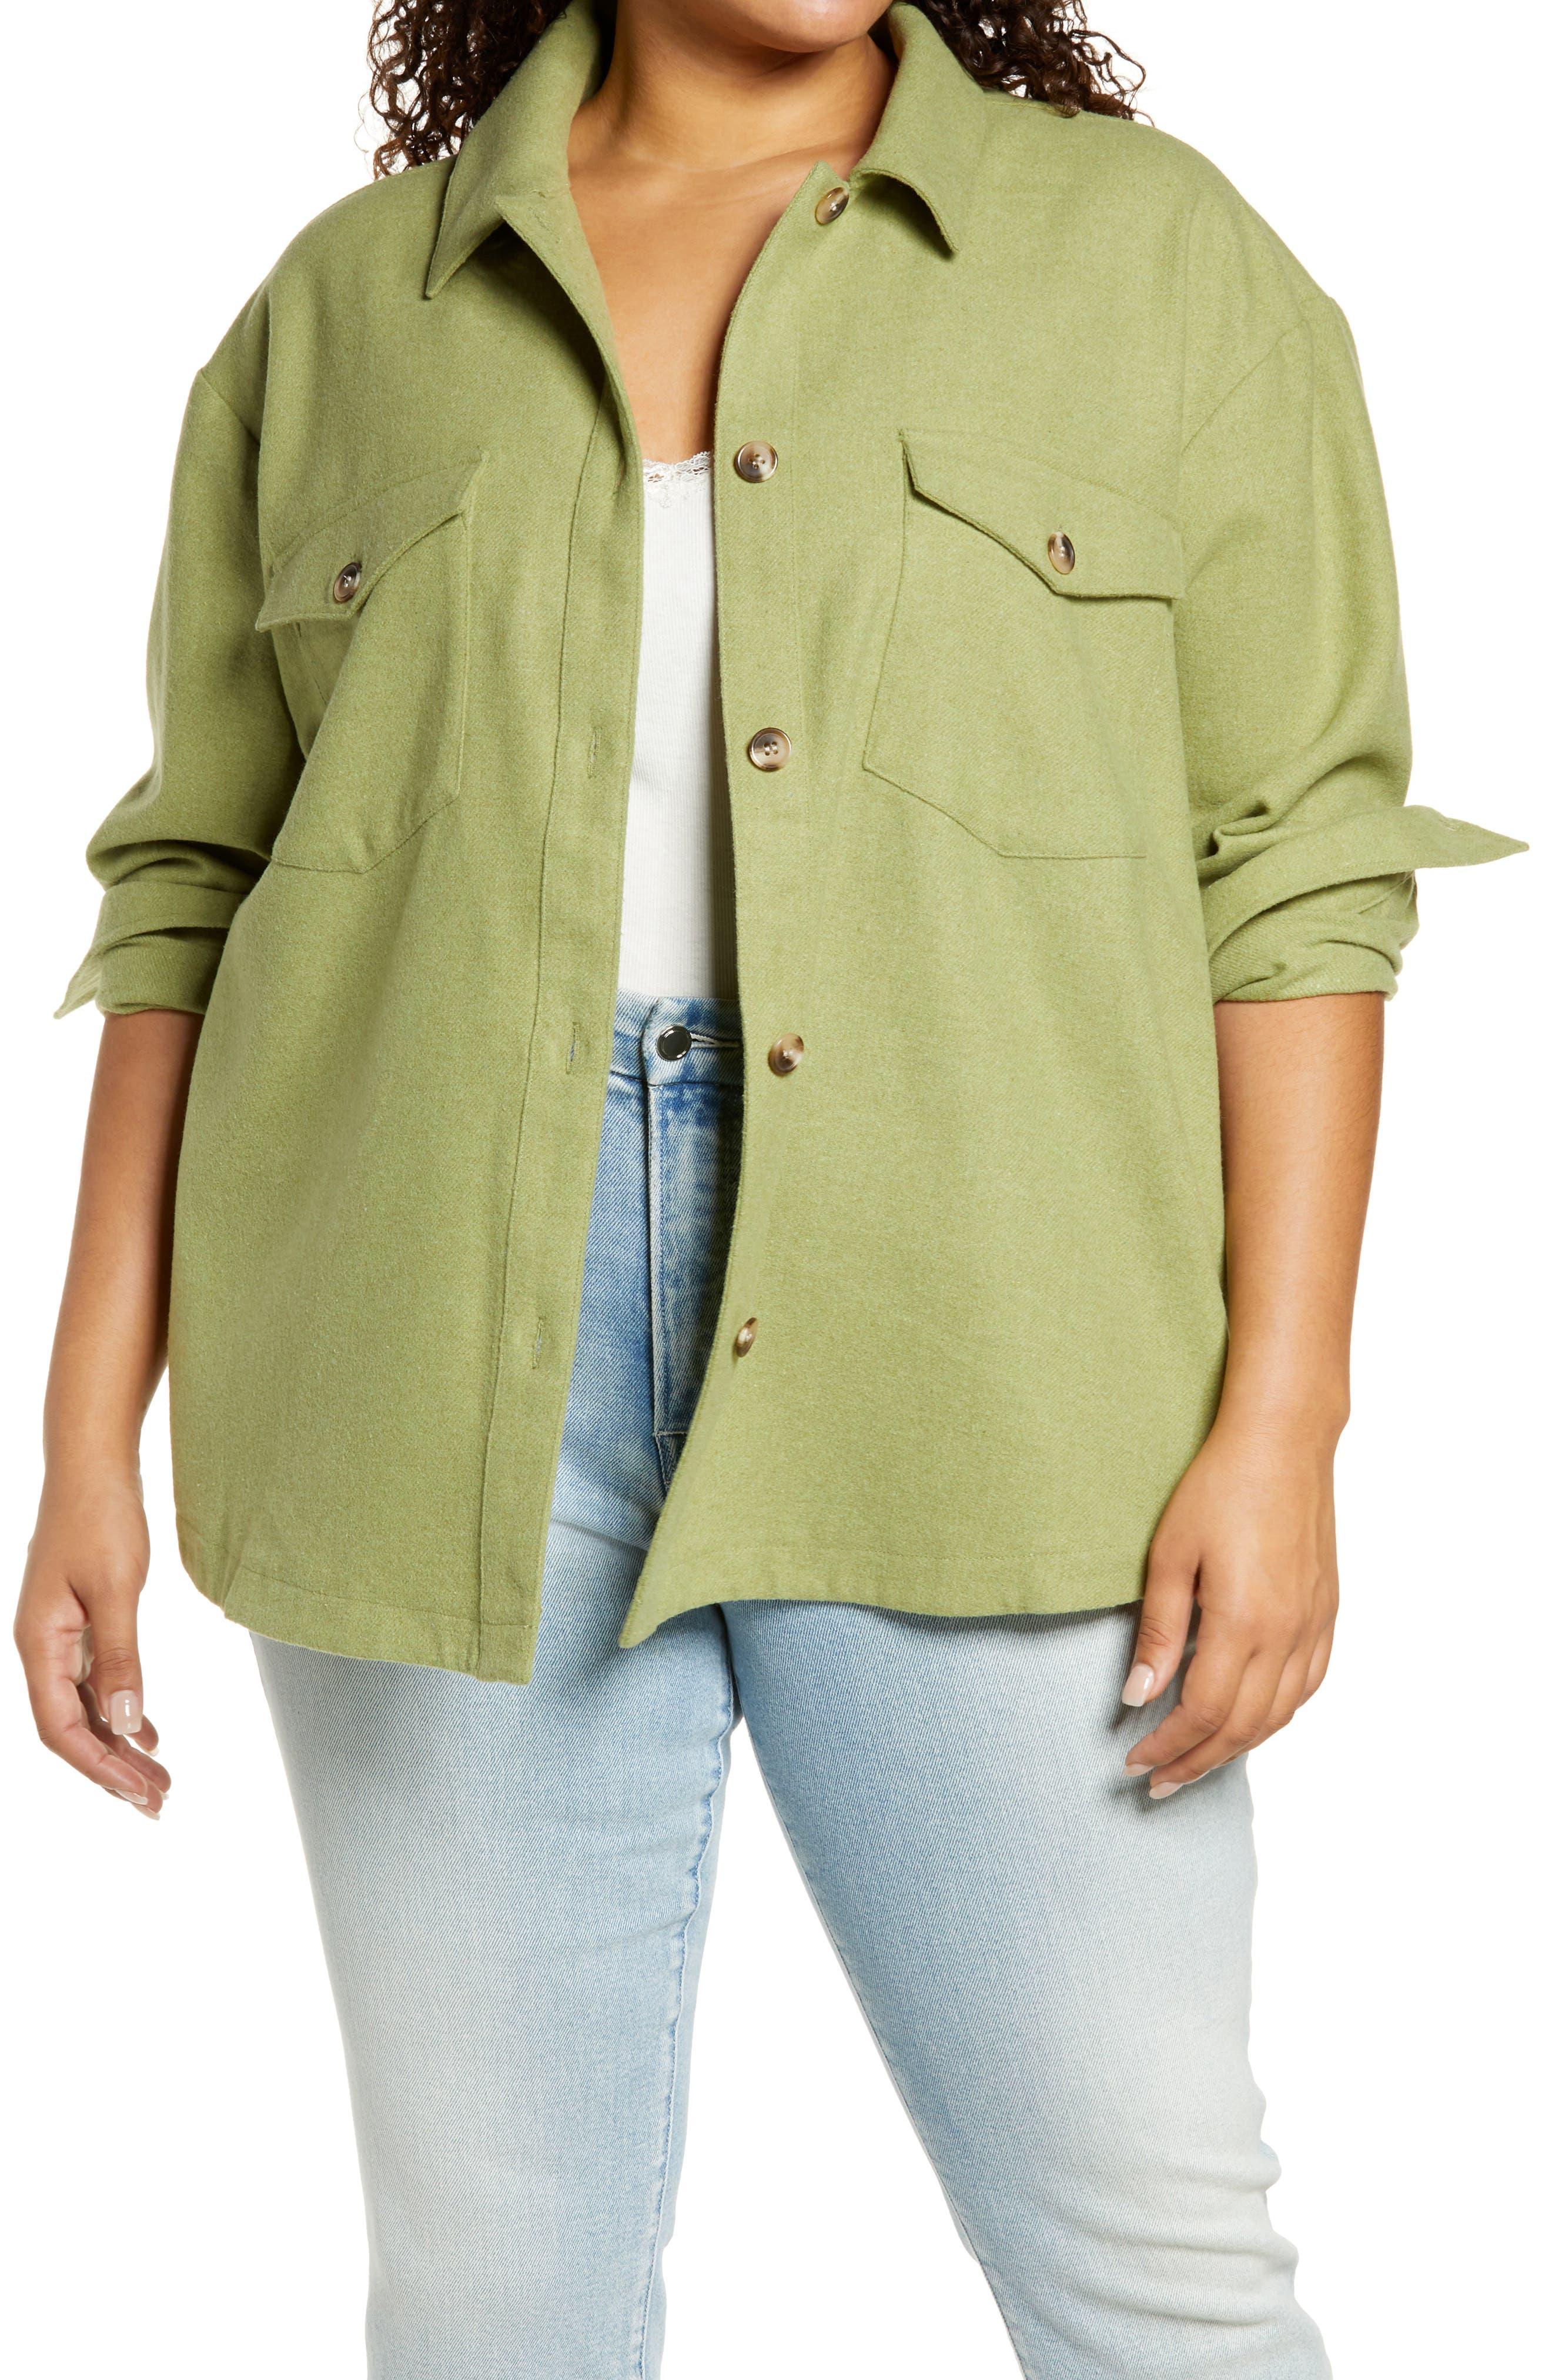 Plus Size Women Camouflage Tassel Jacket Coat Casual Single-breasted Outer Wear